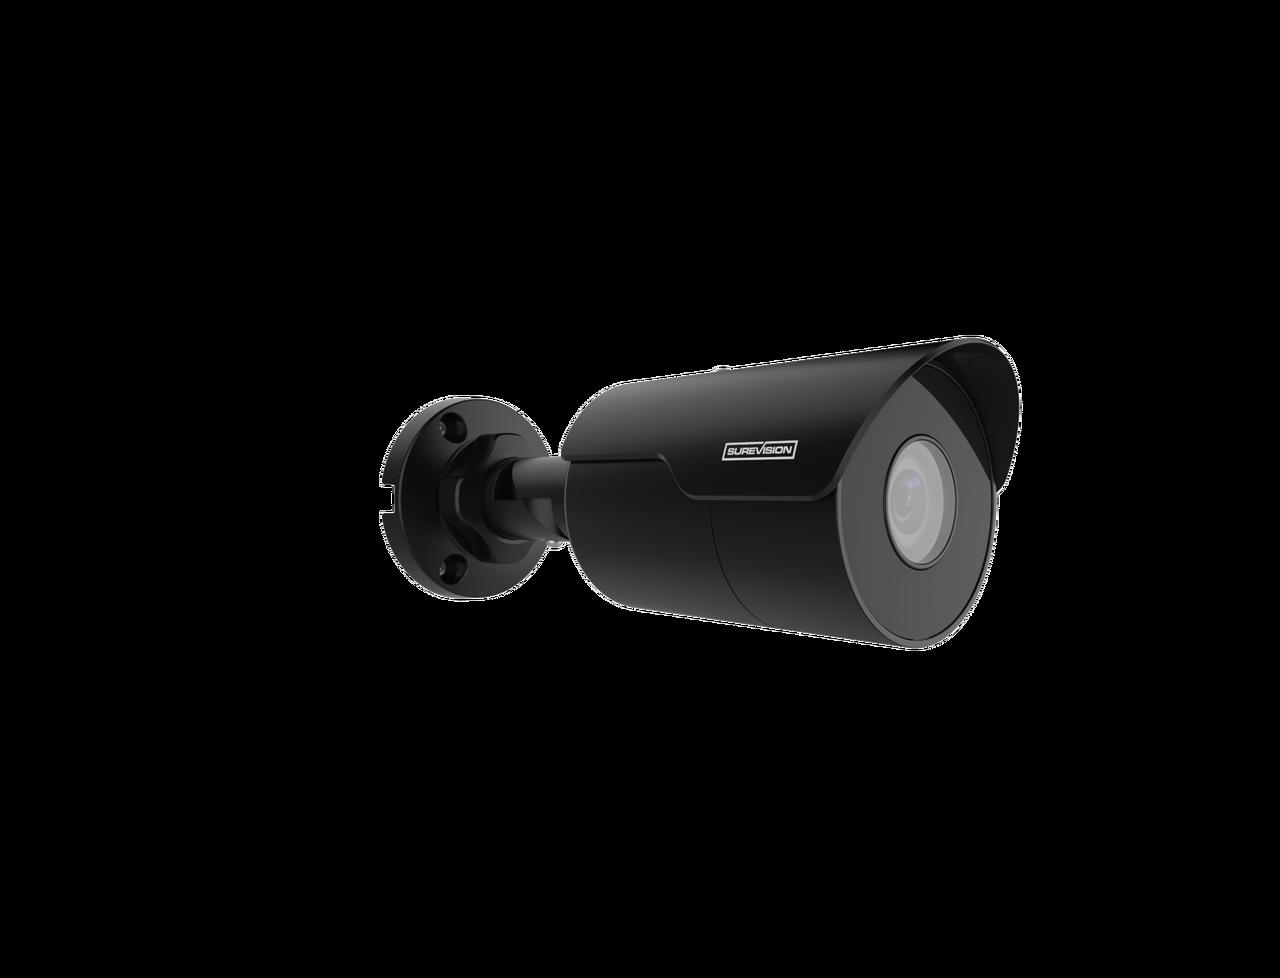 SUREVISION 4K Mini Fixed Bullet Network Camera